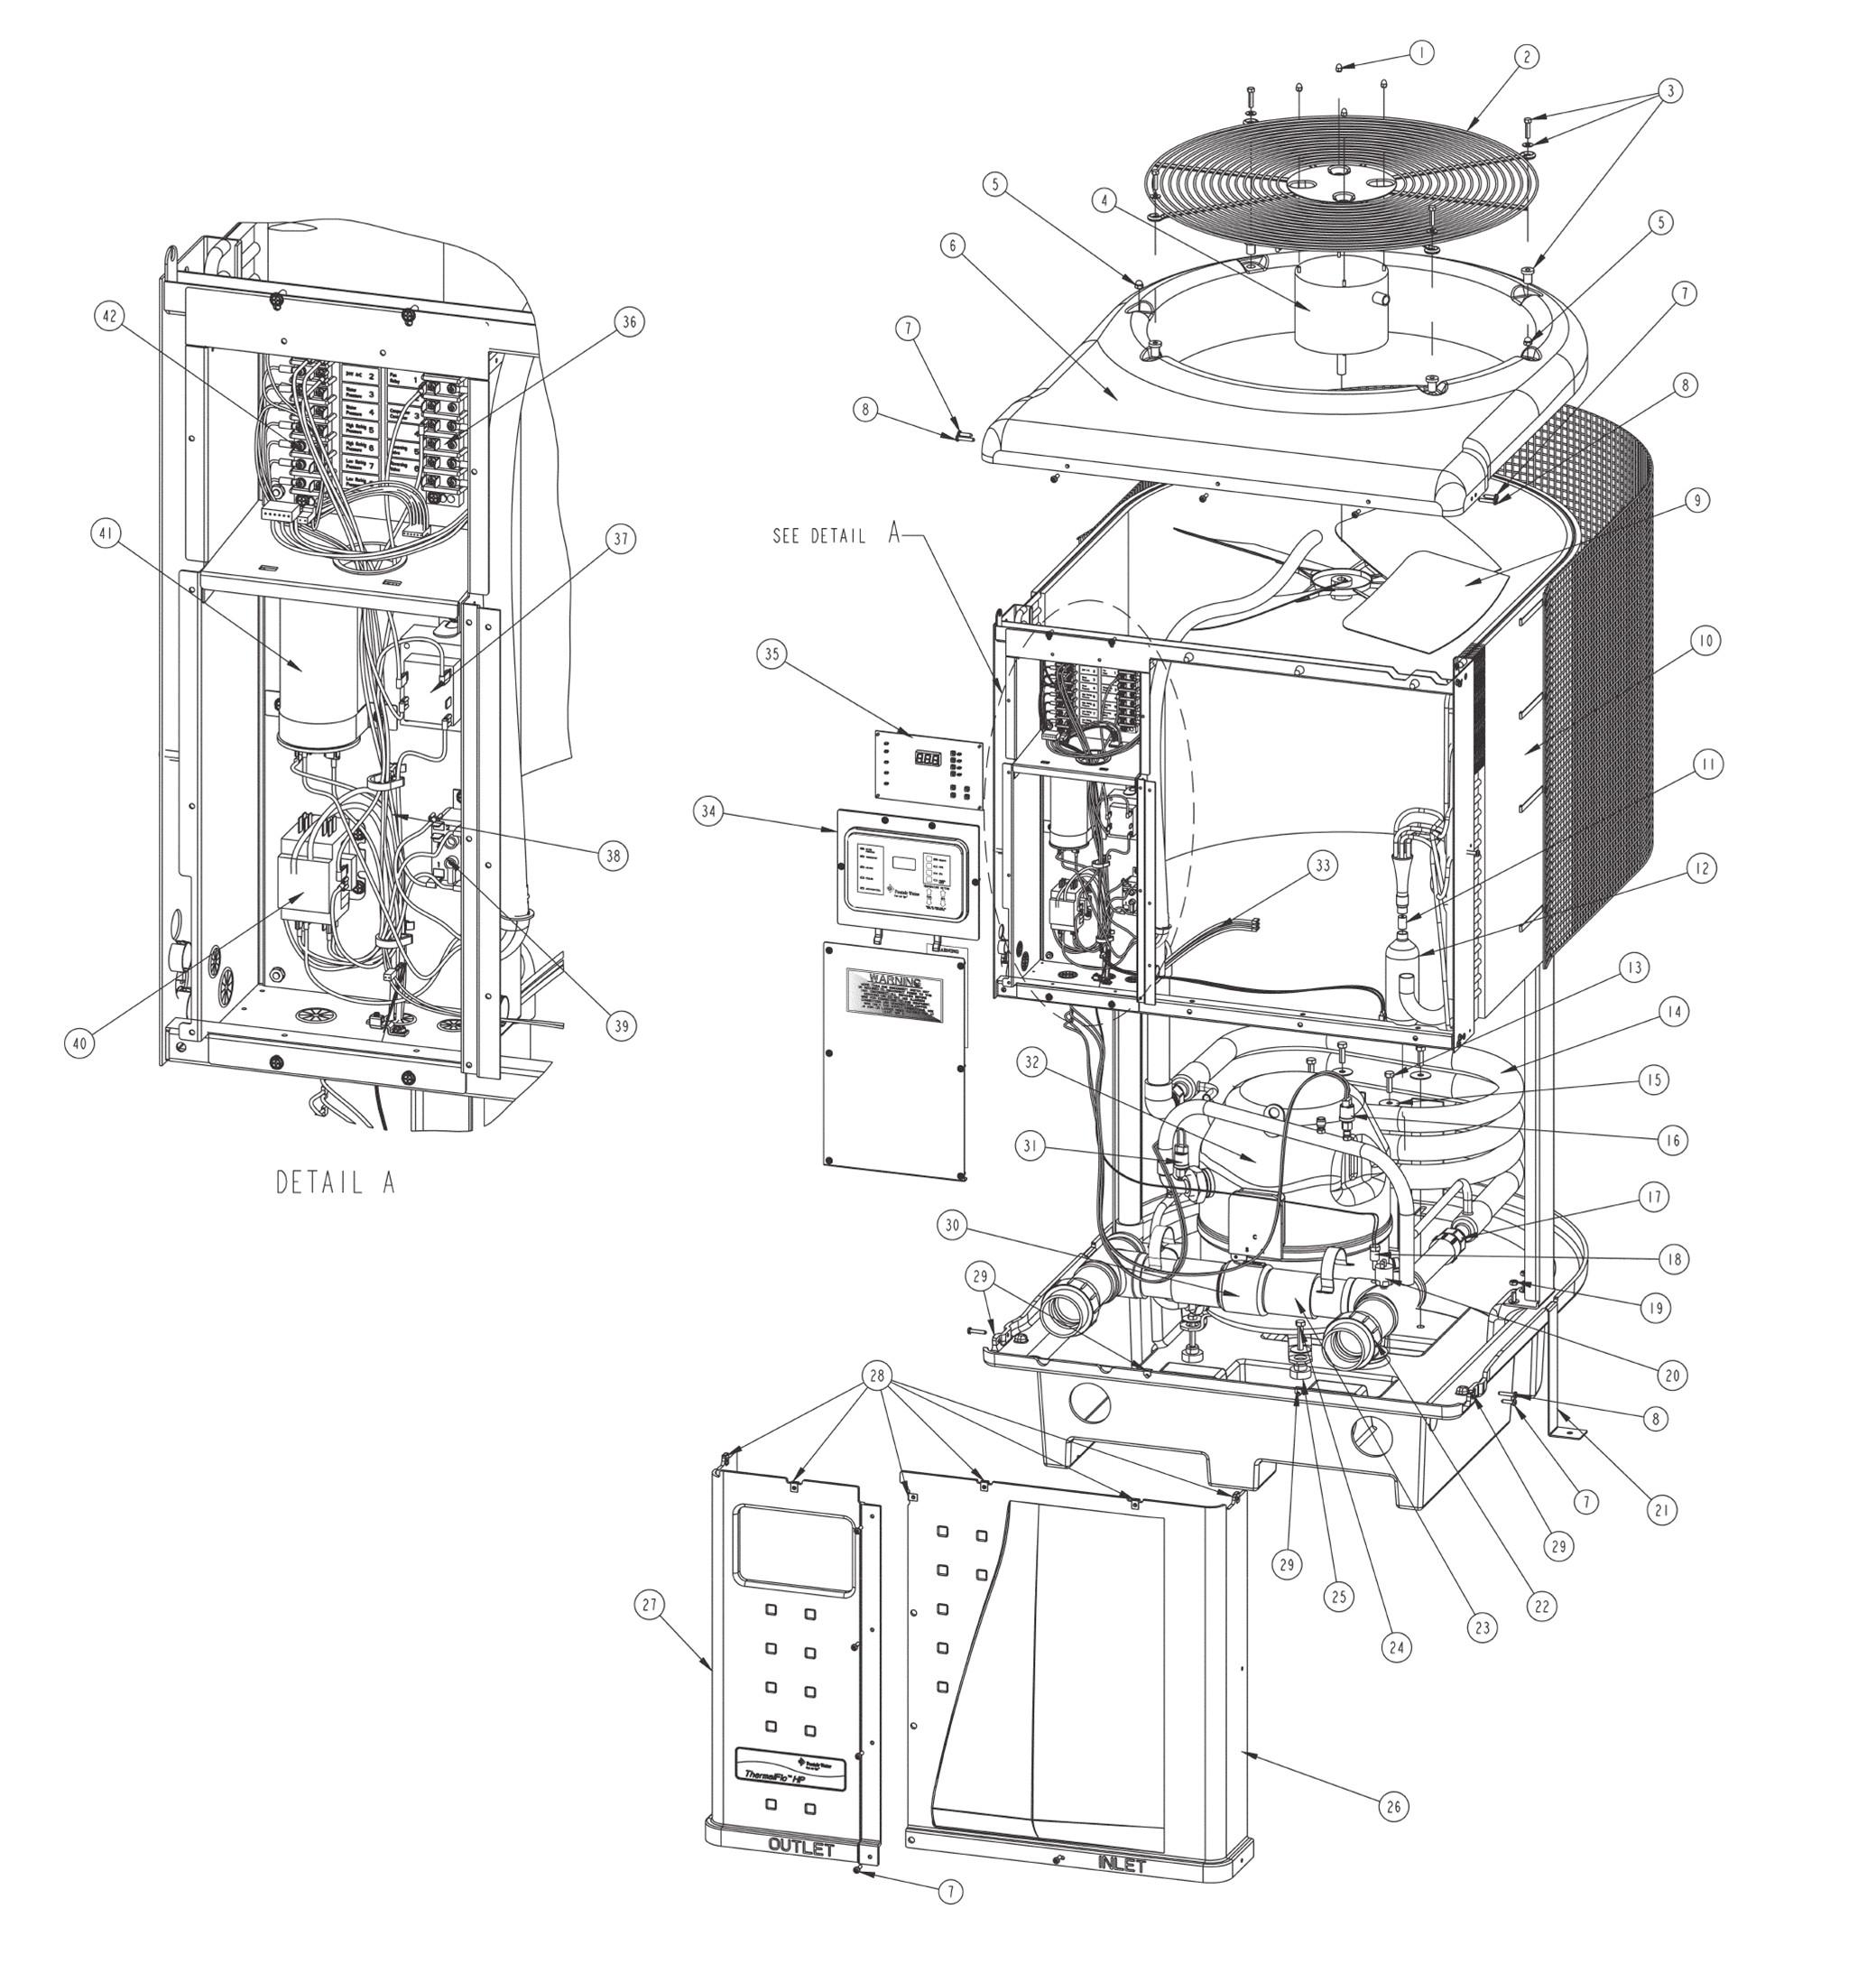 Hayward Pump Parts Diagram Pentair thermalflo™ Heat Pump Parts Of Hayward Pump Parts Diagram